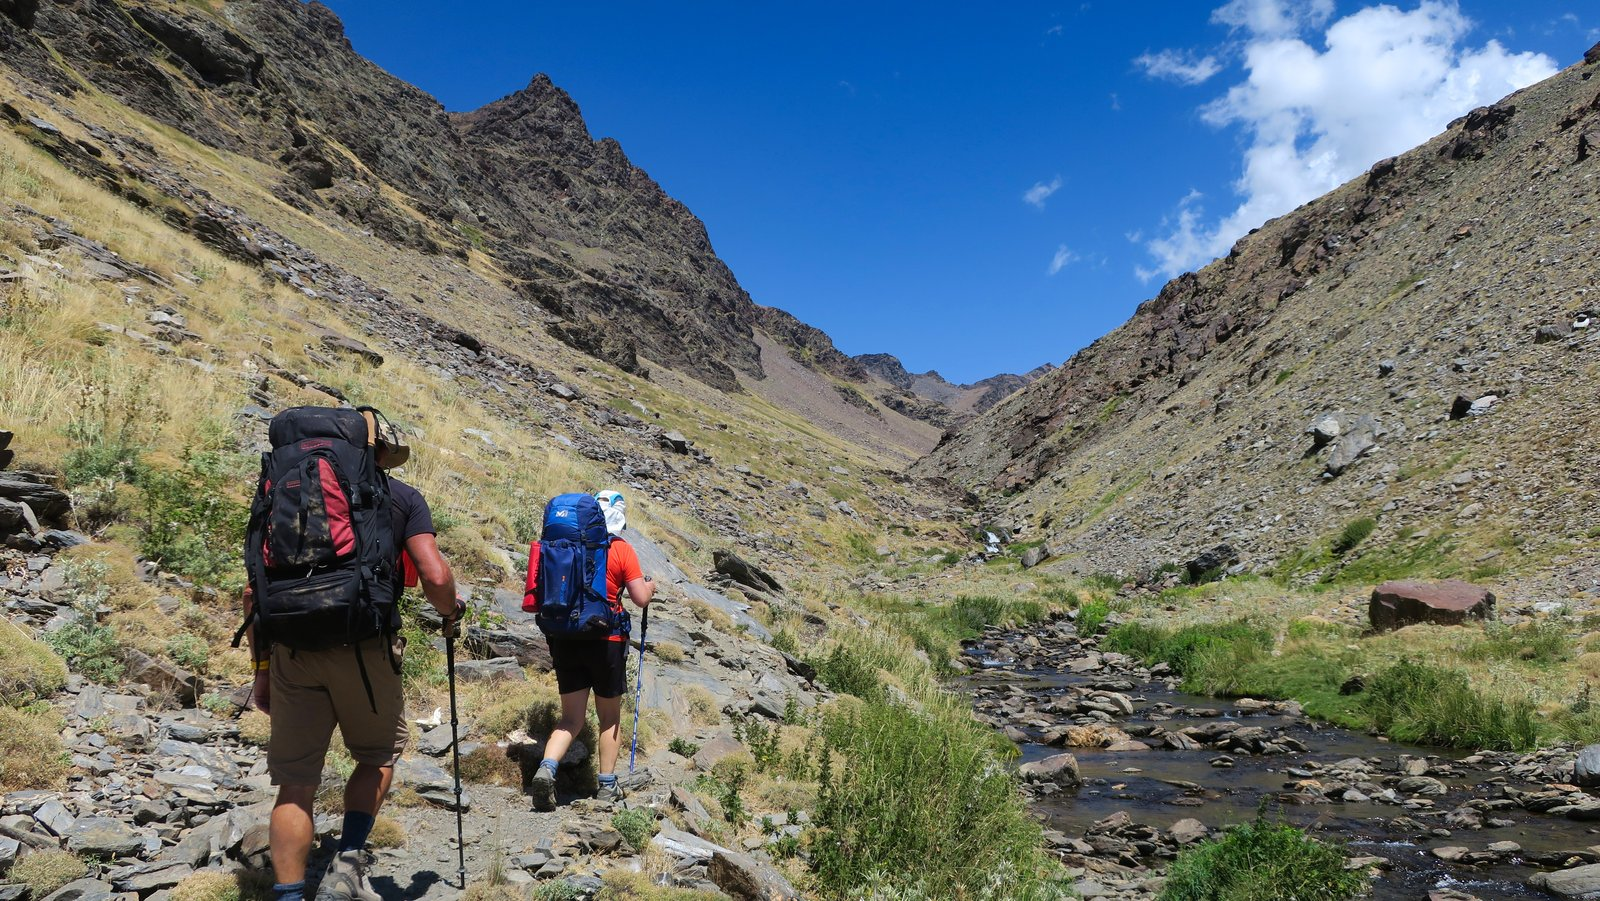 Entering the spectacular upper Lanjaron Valley